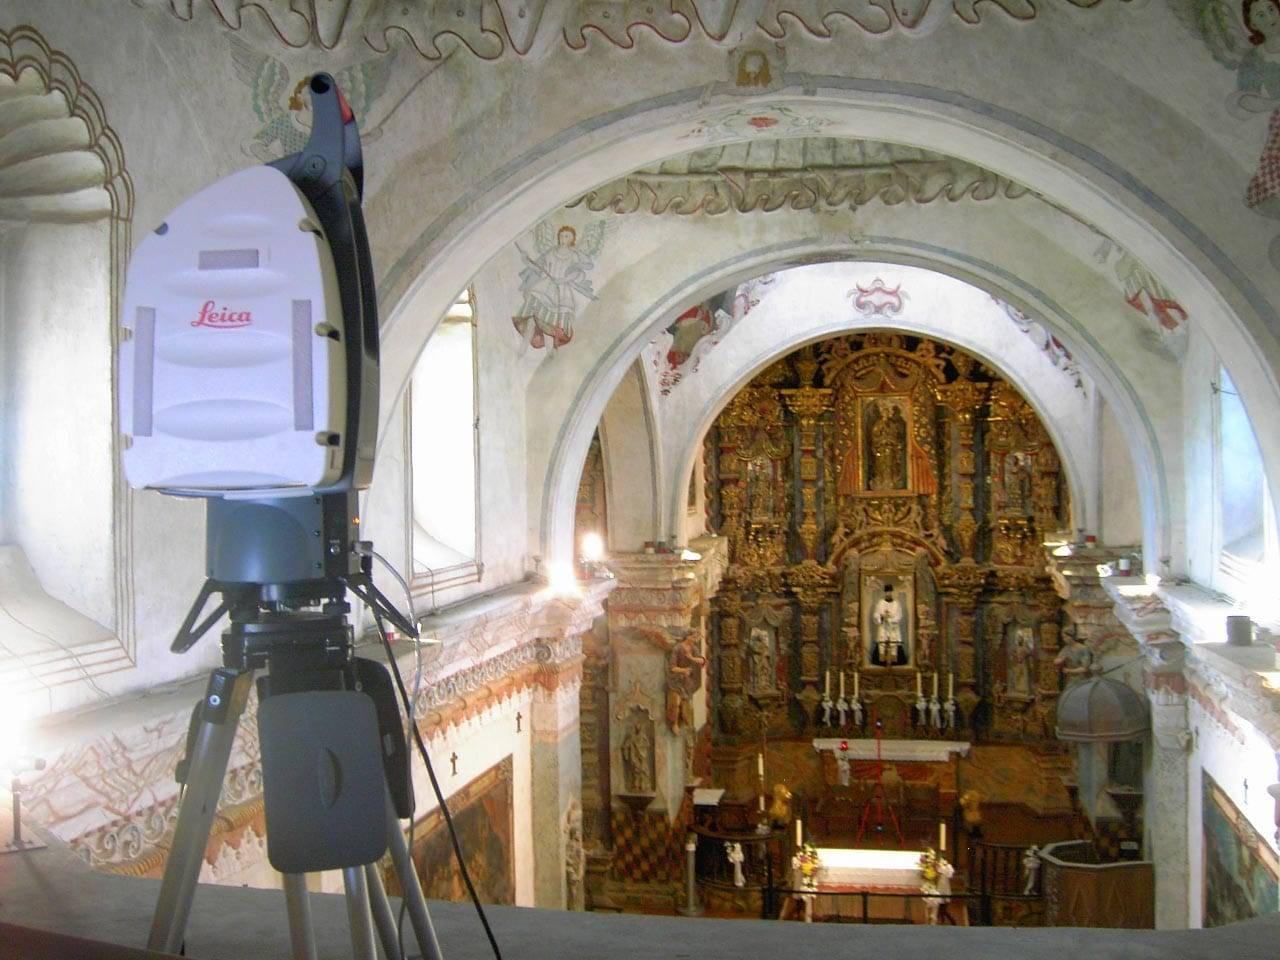 3d scanner setup to capture cathedral interior